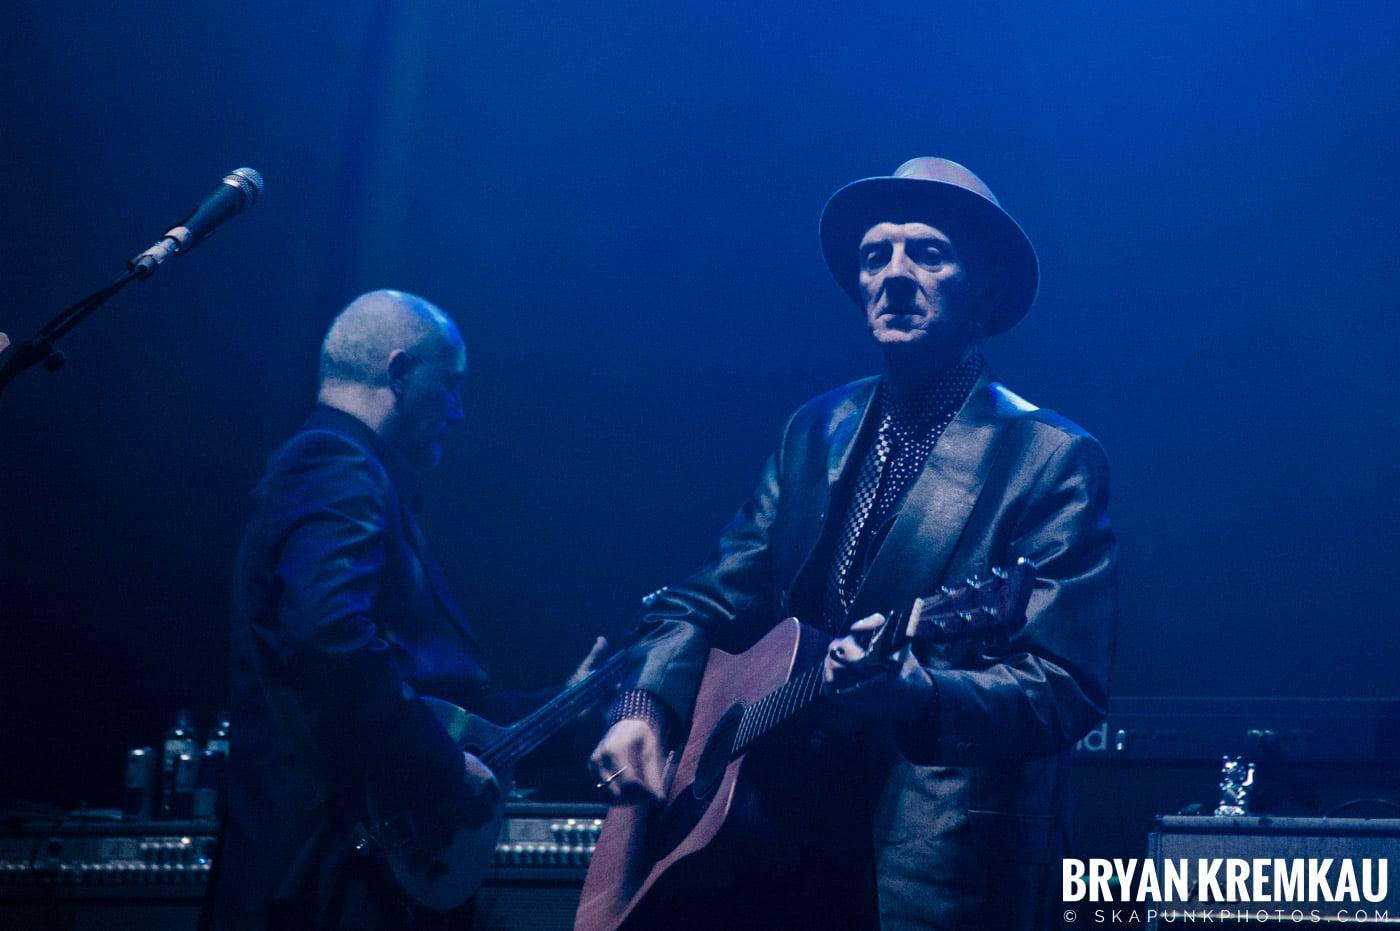 The Pogues @ Brixton Academy, London UK - 12.17.06 (17)